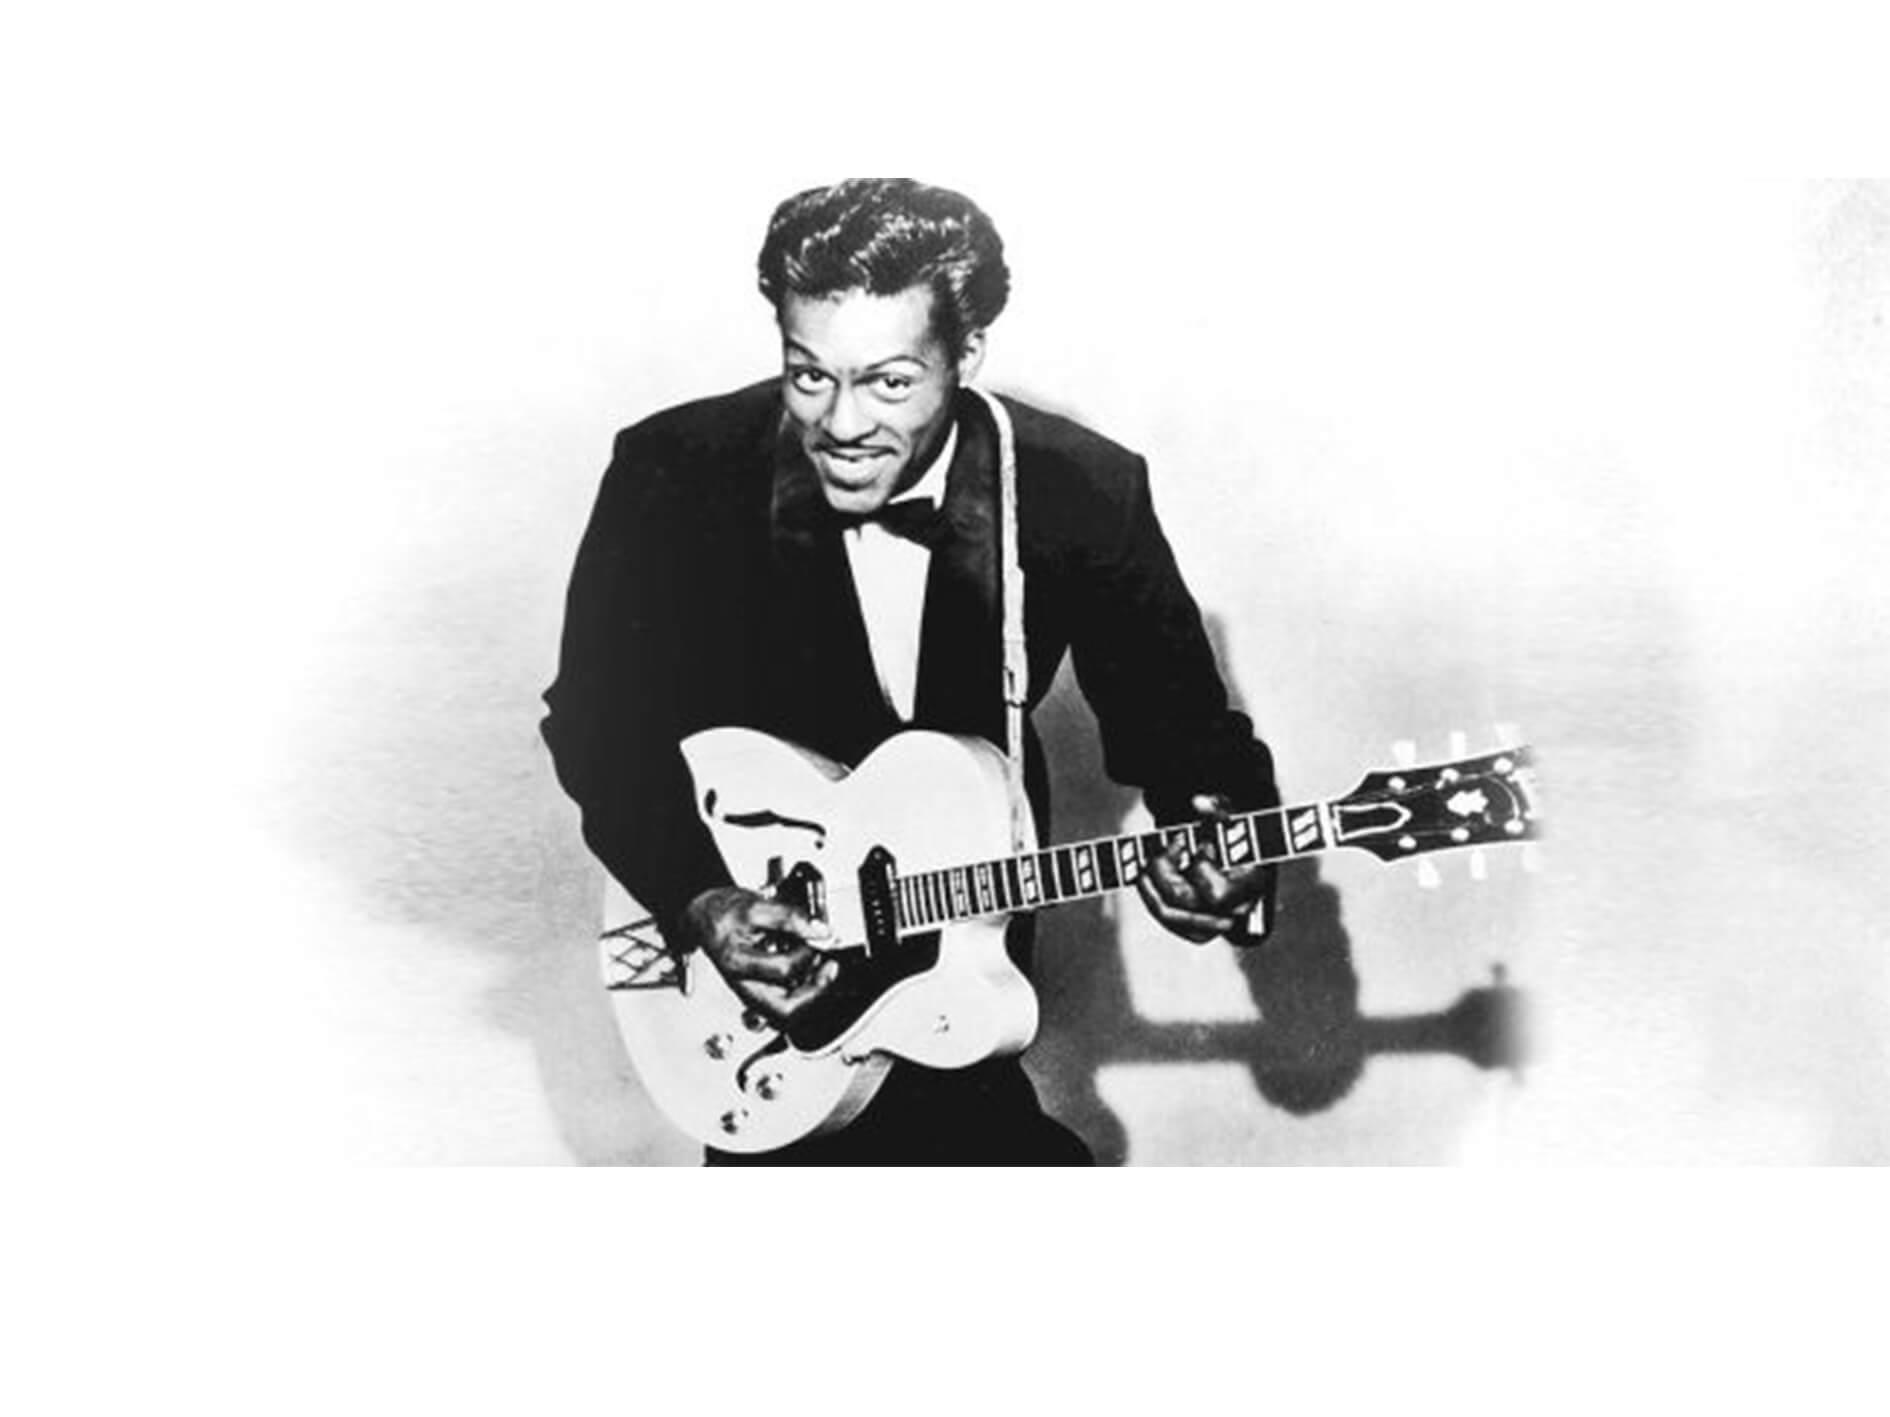 بیوگرافی چاک بری (Chuck Berry) اولین شاعر راک